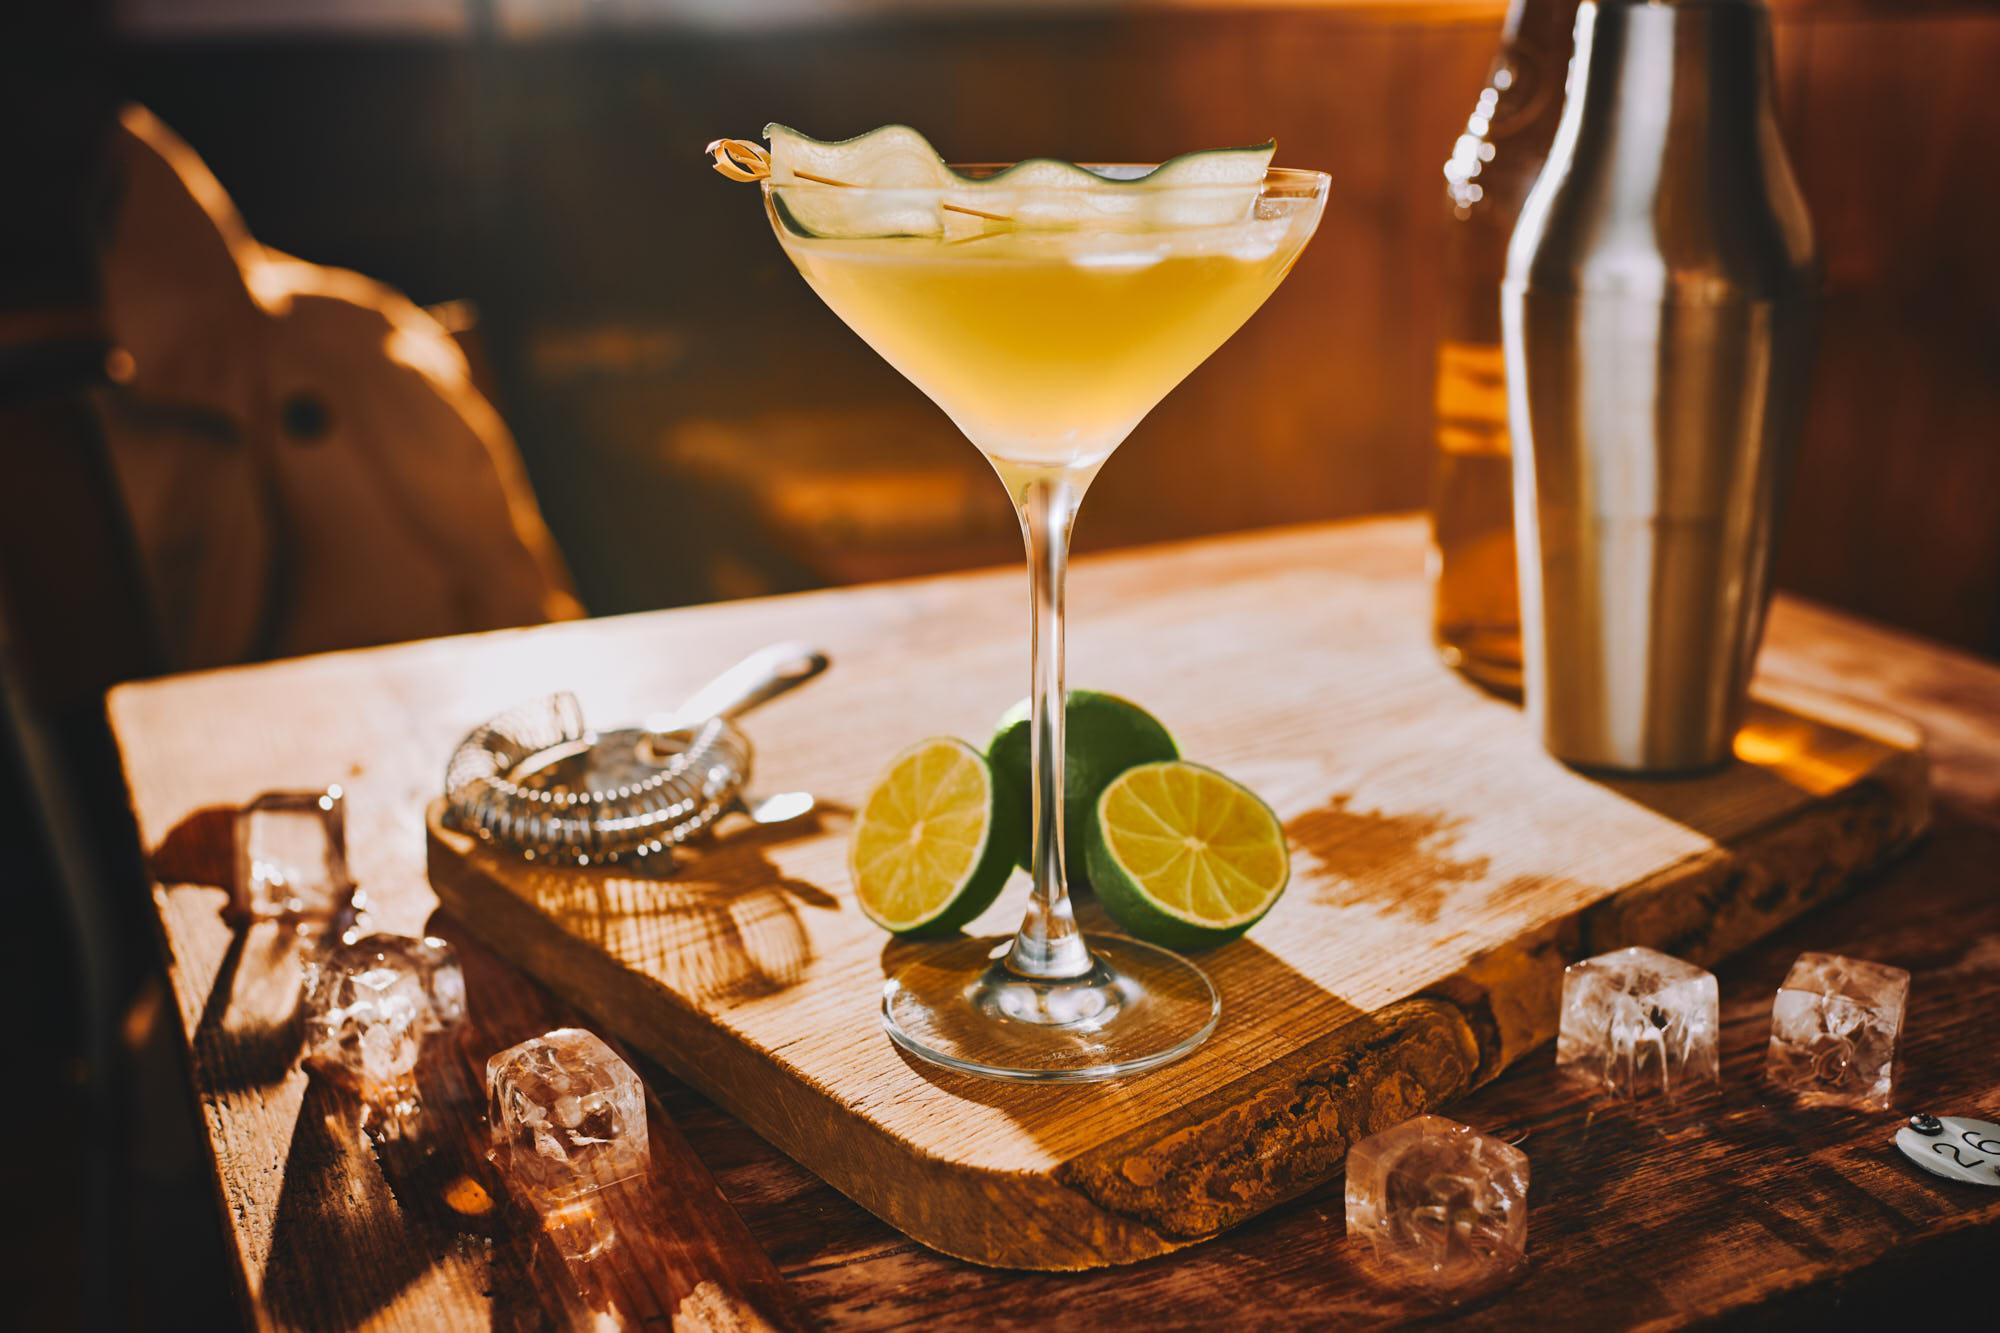 sundowner cocktail drinks lifestyle photography by award winning young photographer matthew lloyd